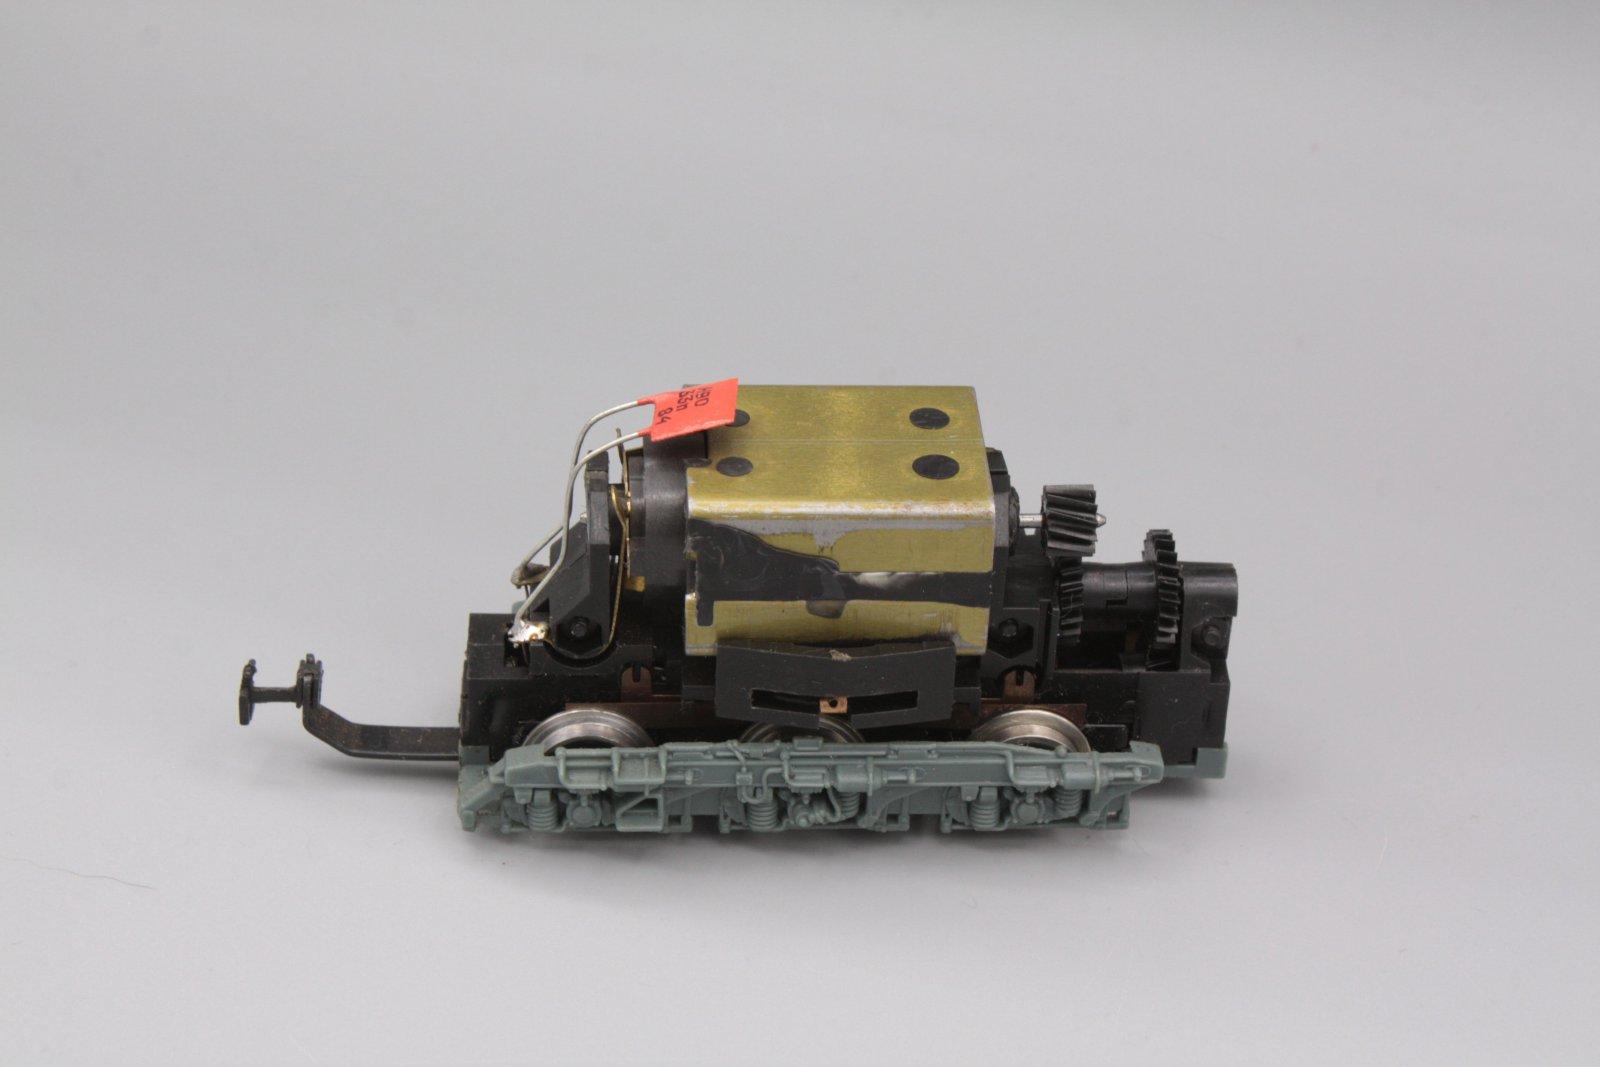 Ersatzteil Piko 130 Drehgestell mit Motor - geprüft- Antriebsdrehgestell -grau